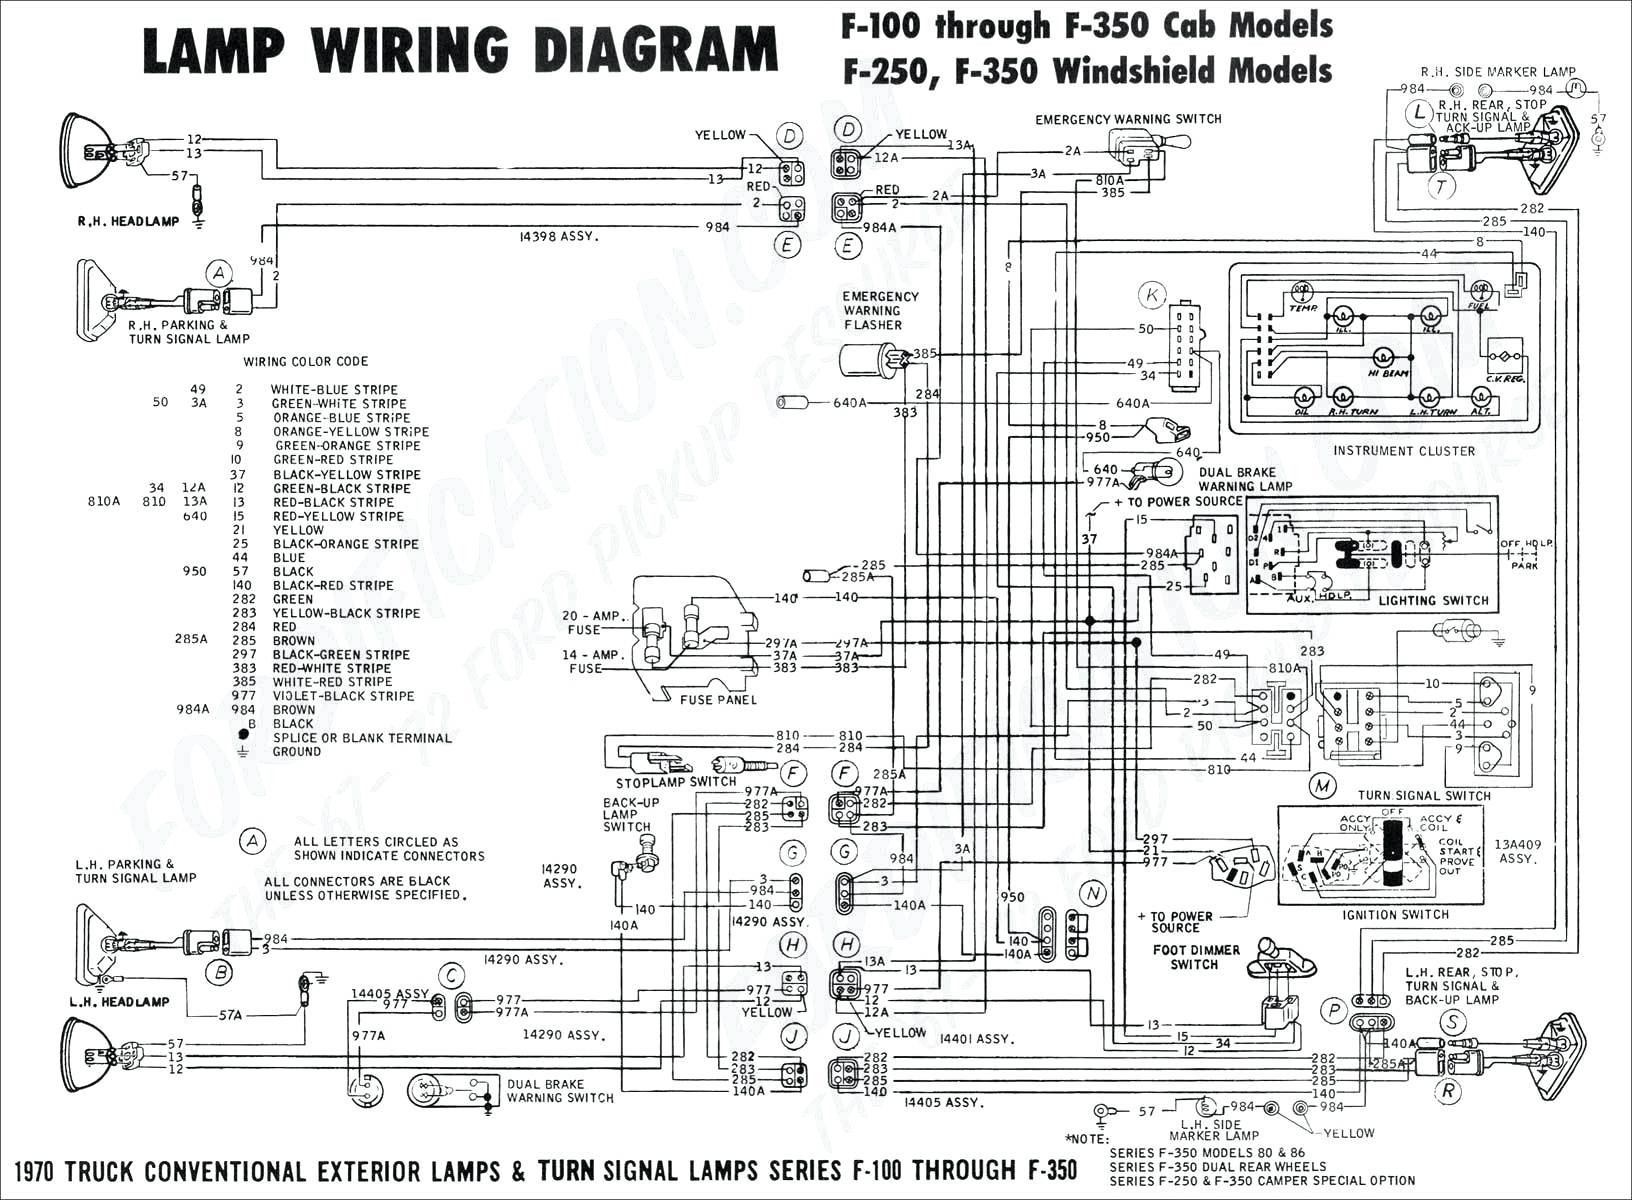 2002 dodge intrepid engine diagram 2001 ford f550 wiring